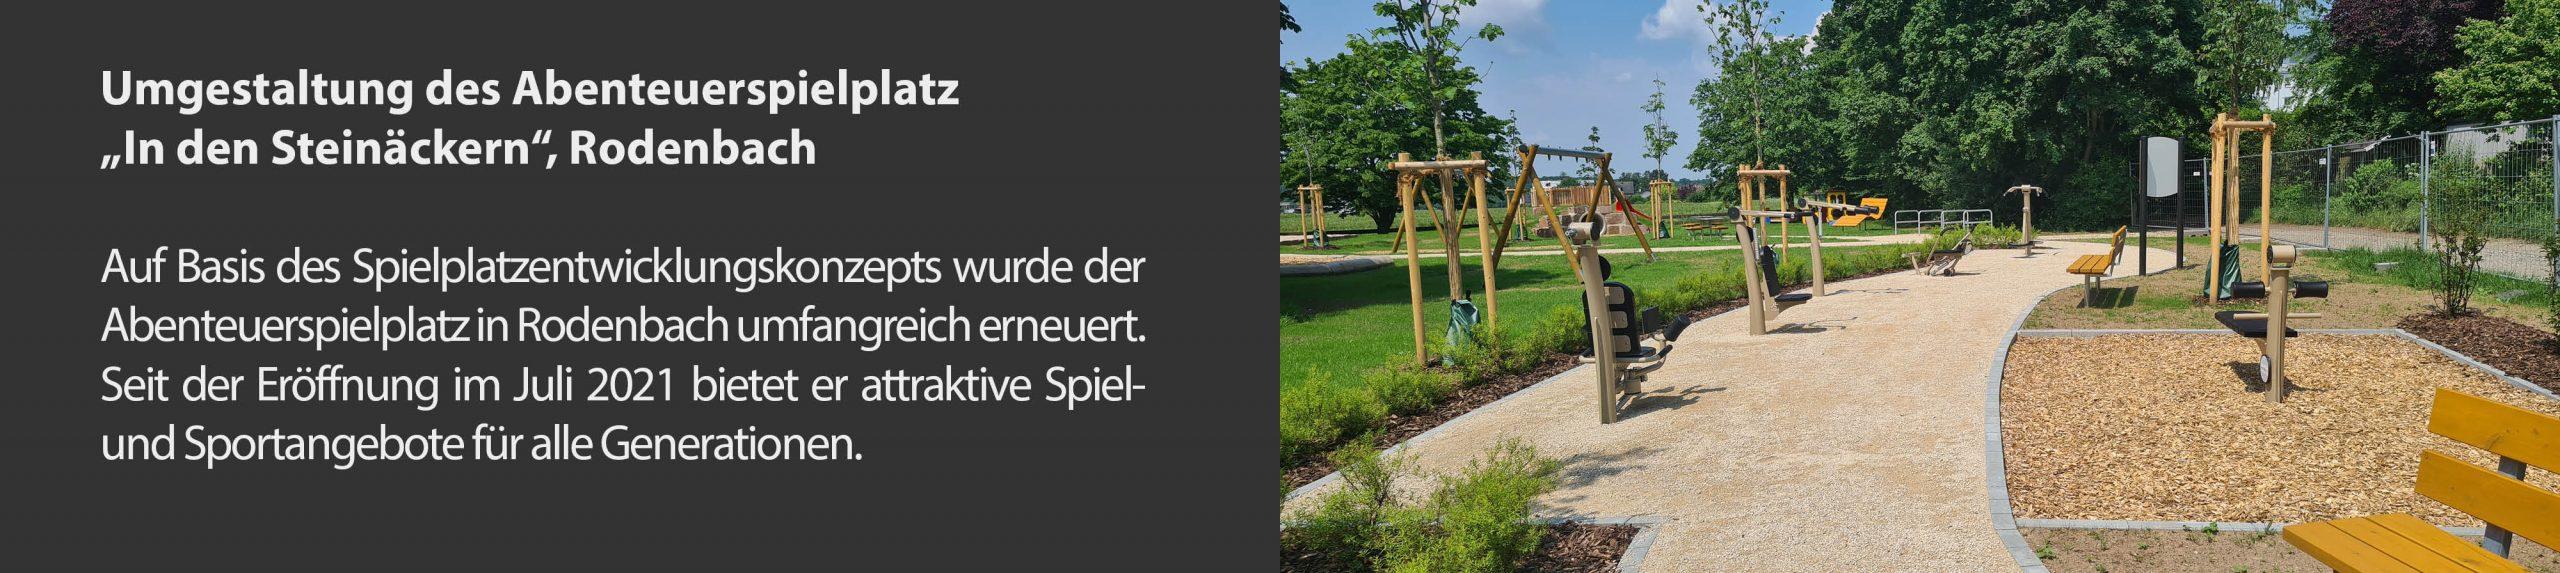 header_abenteuerspielplatz-rodenbach